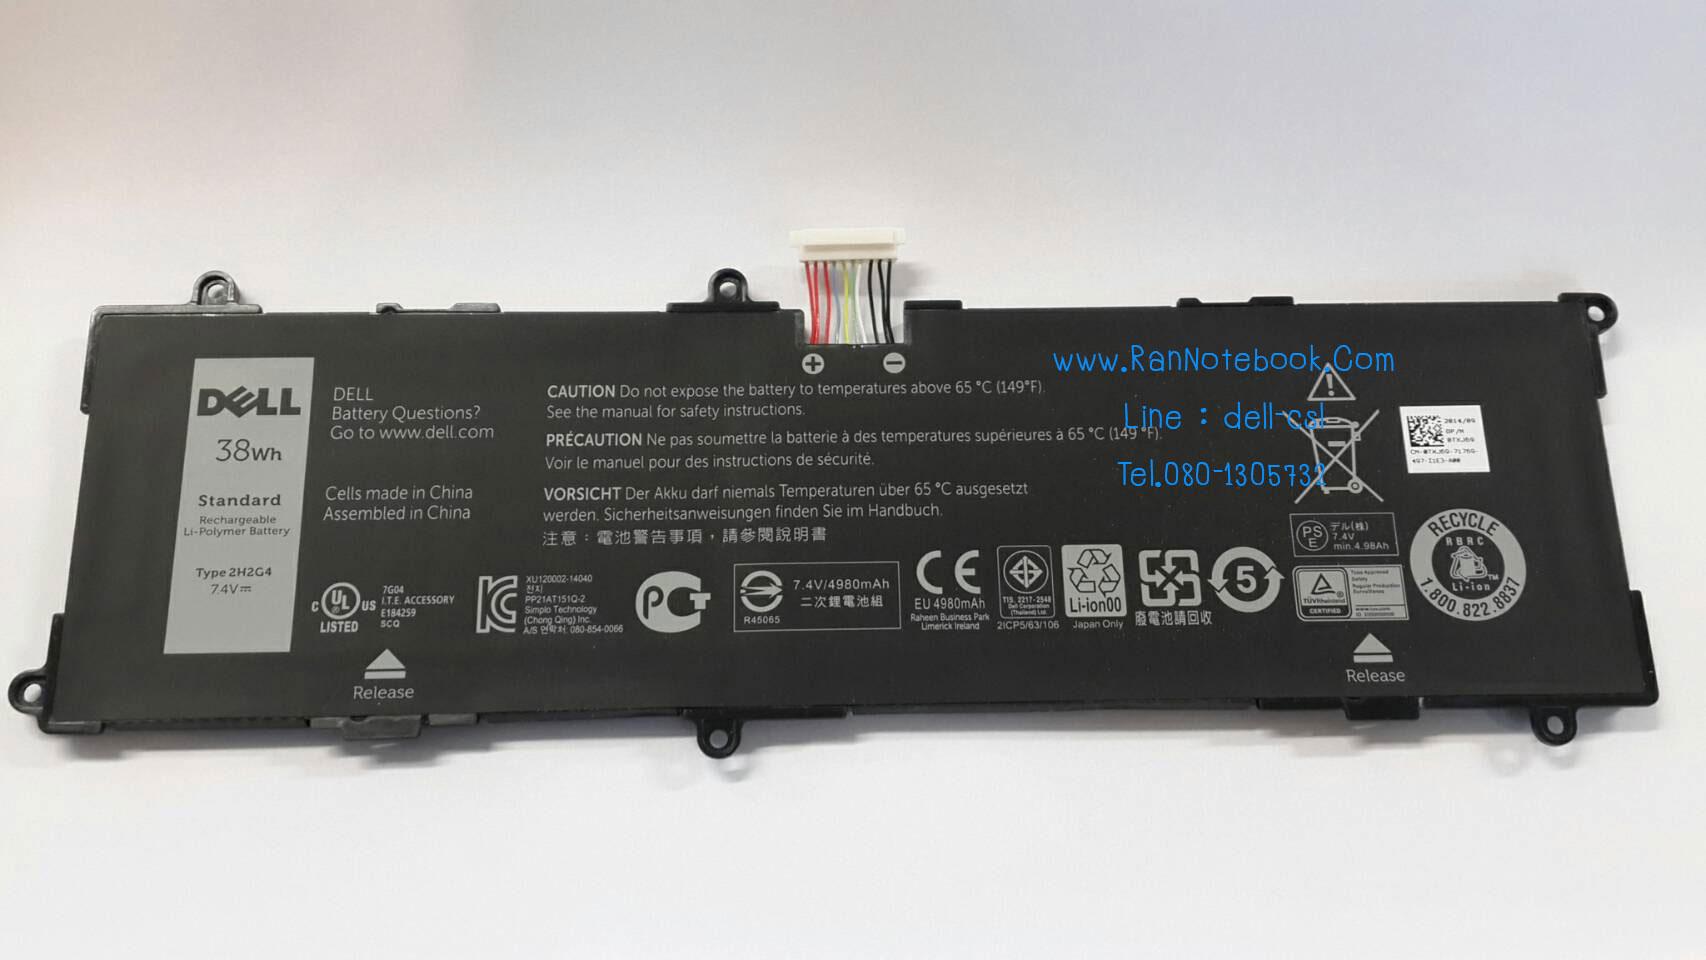 Battery DELL ของแท้ Venue 11 Pro 7140 ประกันศูนย์ DELL ราคา ไม่แพง